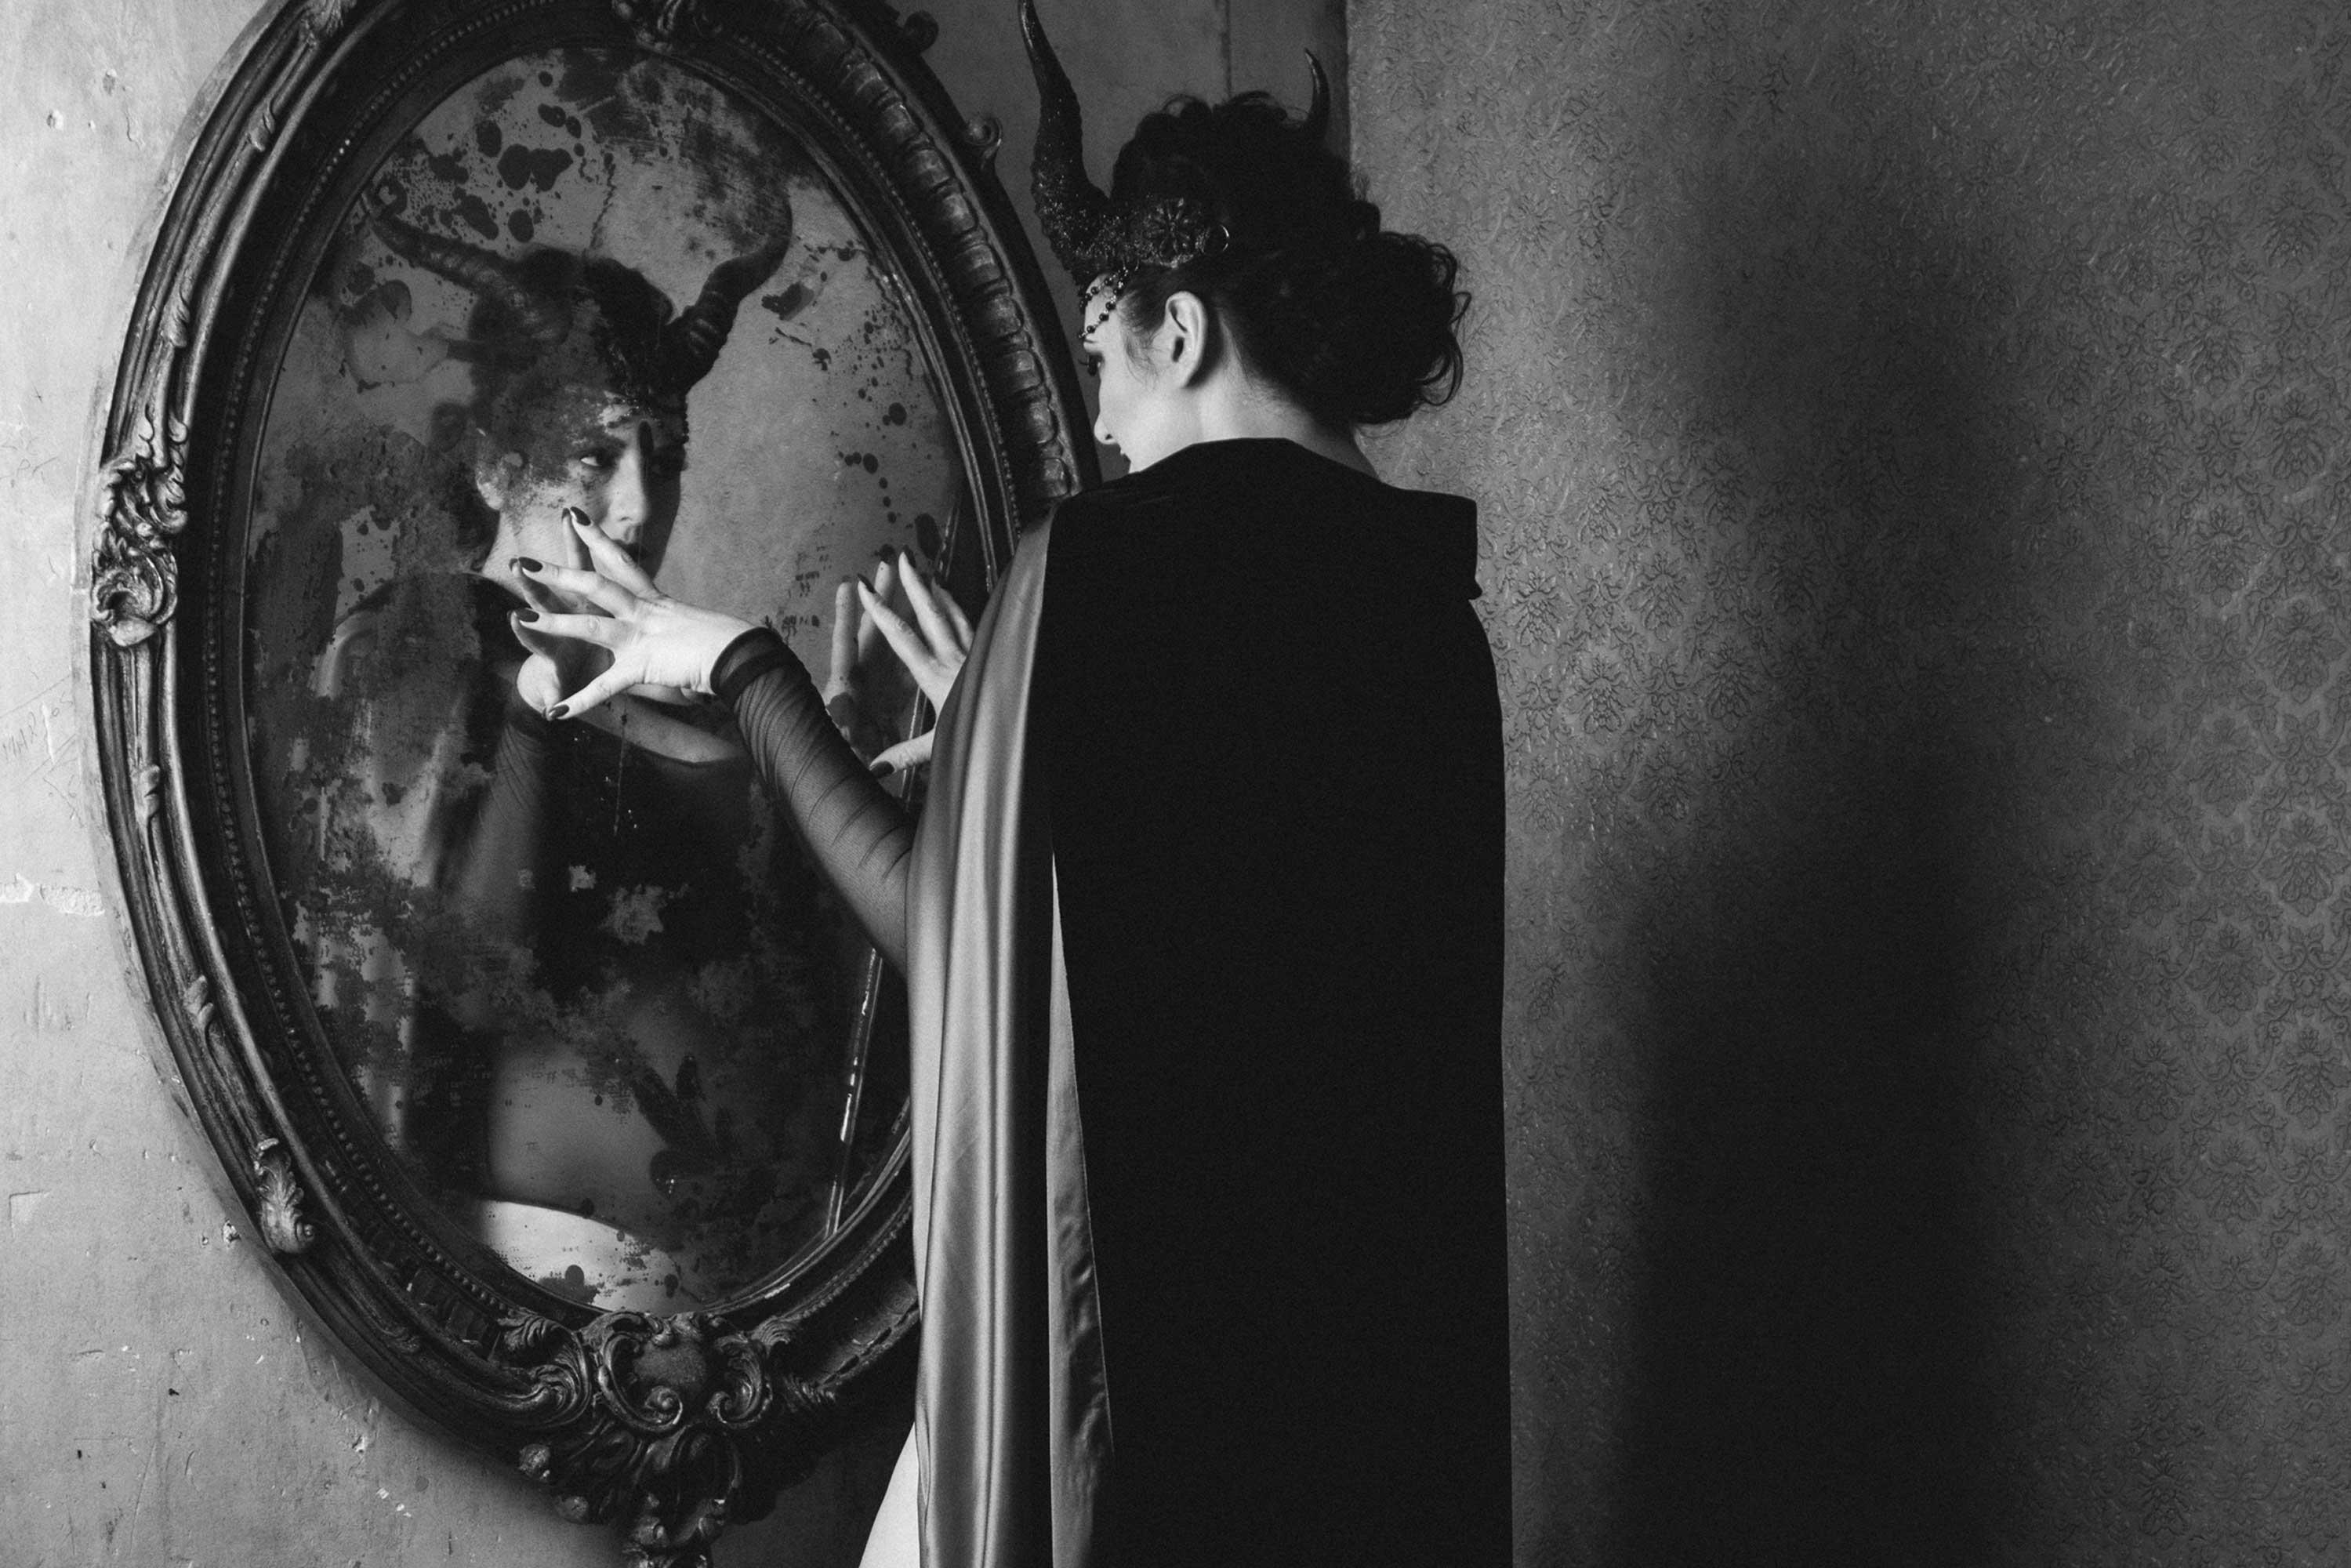 Lady May Den Voyage © Tigz Rice Studios 2016. https://www.tigzrice.com